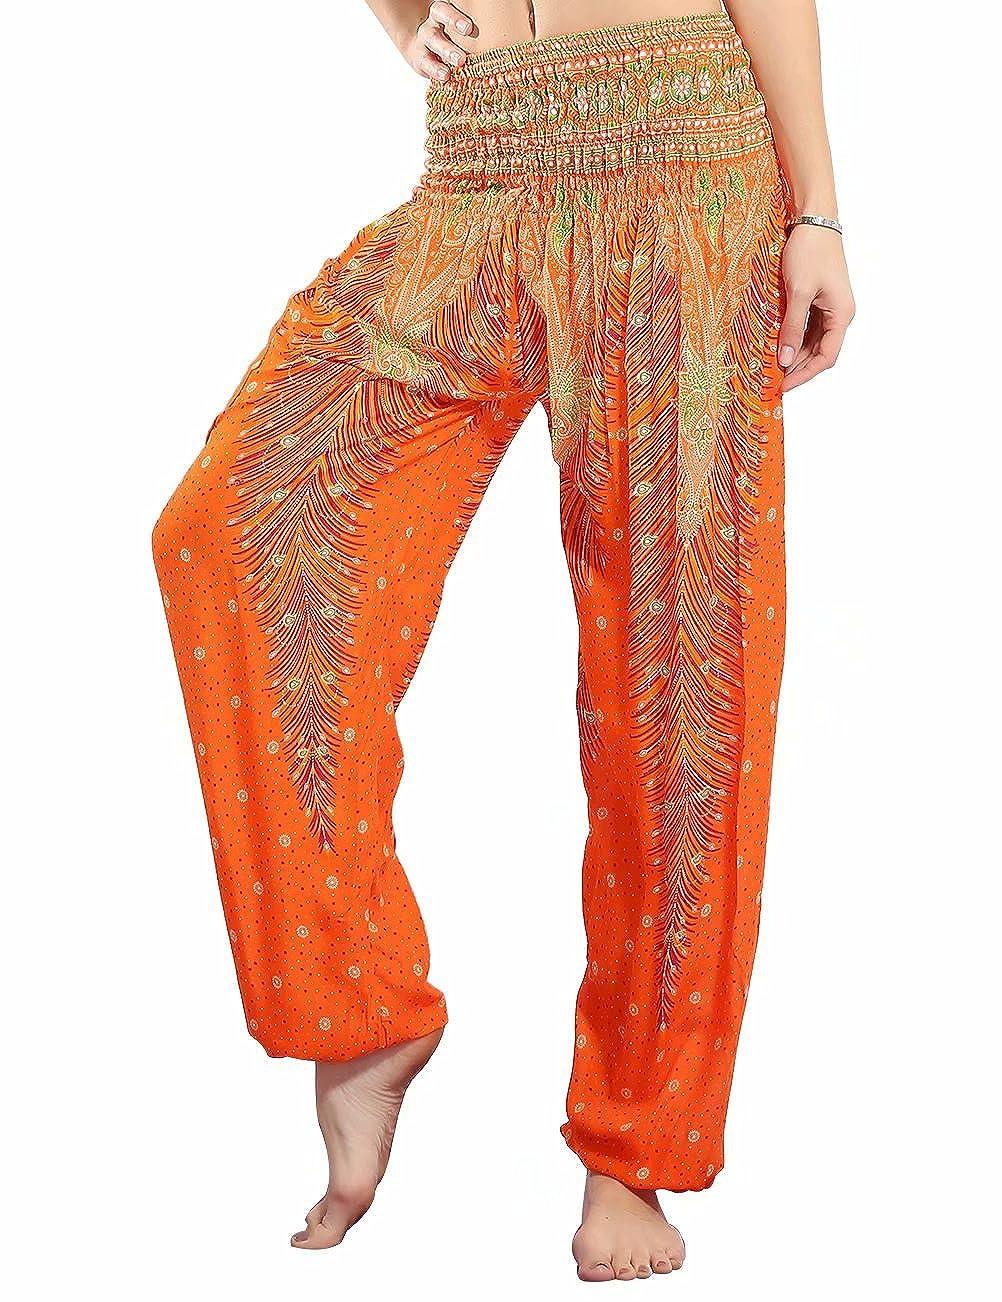 orange NORMOV Boho Harem Pants for Women Bohemian Yoga Loose Peacock Feather High Waisted Active Pants